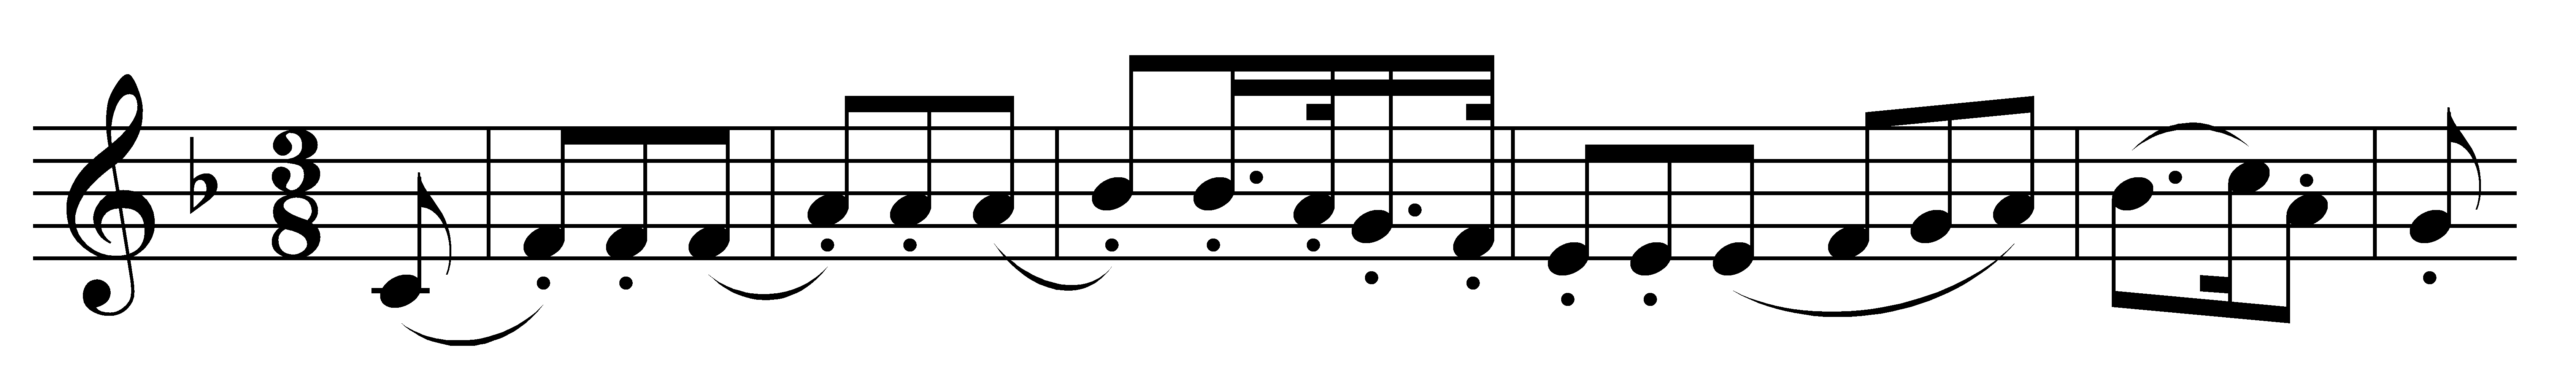 PNG Symphony - 56891